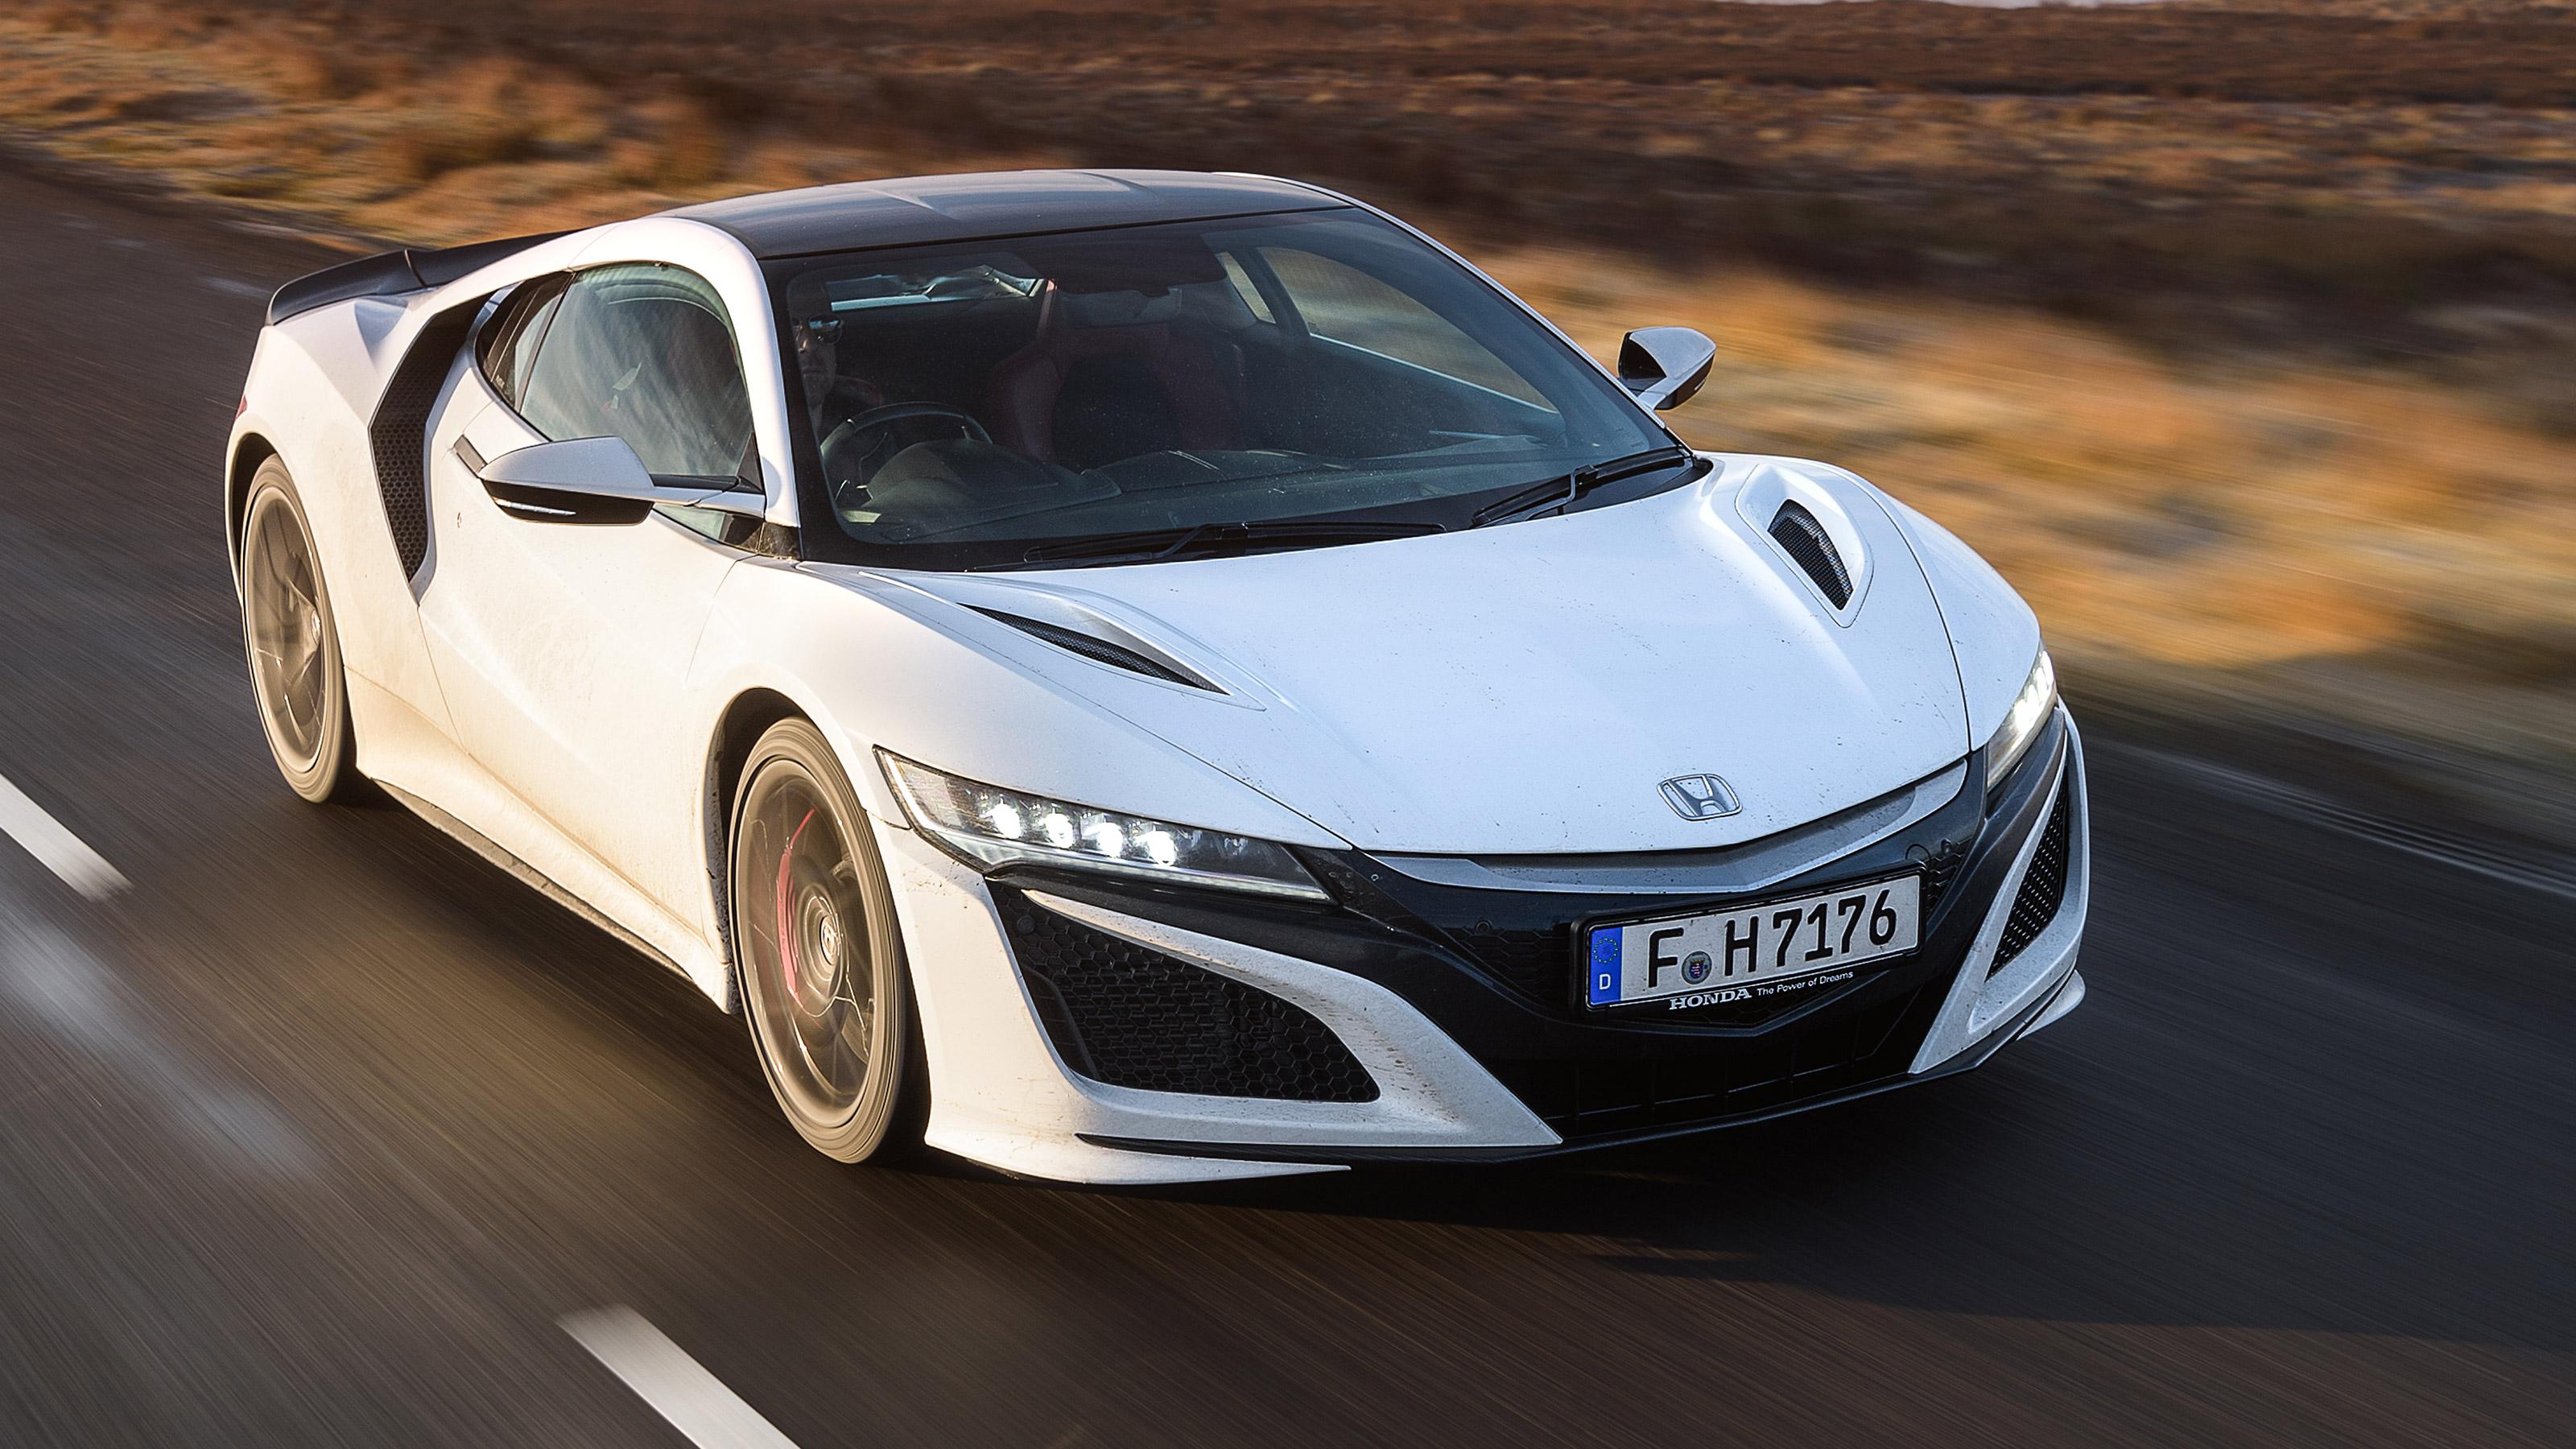 Honda Nsx Review Japan S Underrated Hybrid Supercar Evo